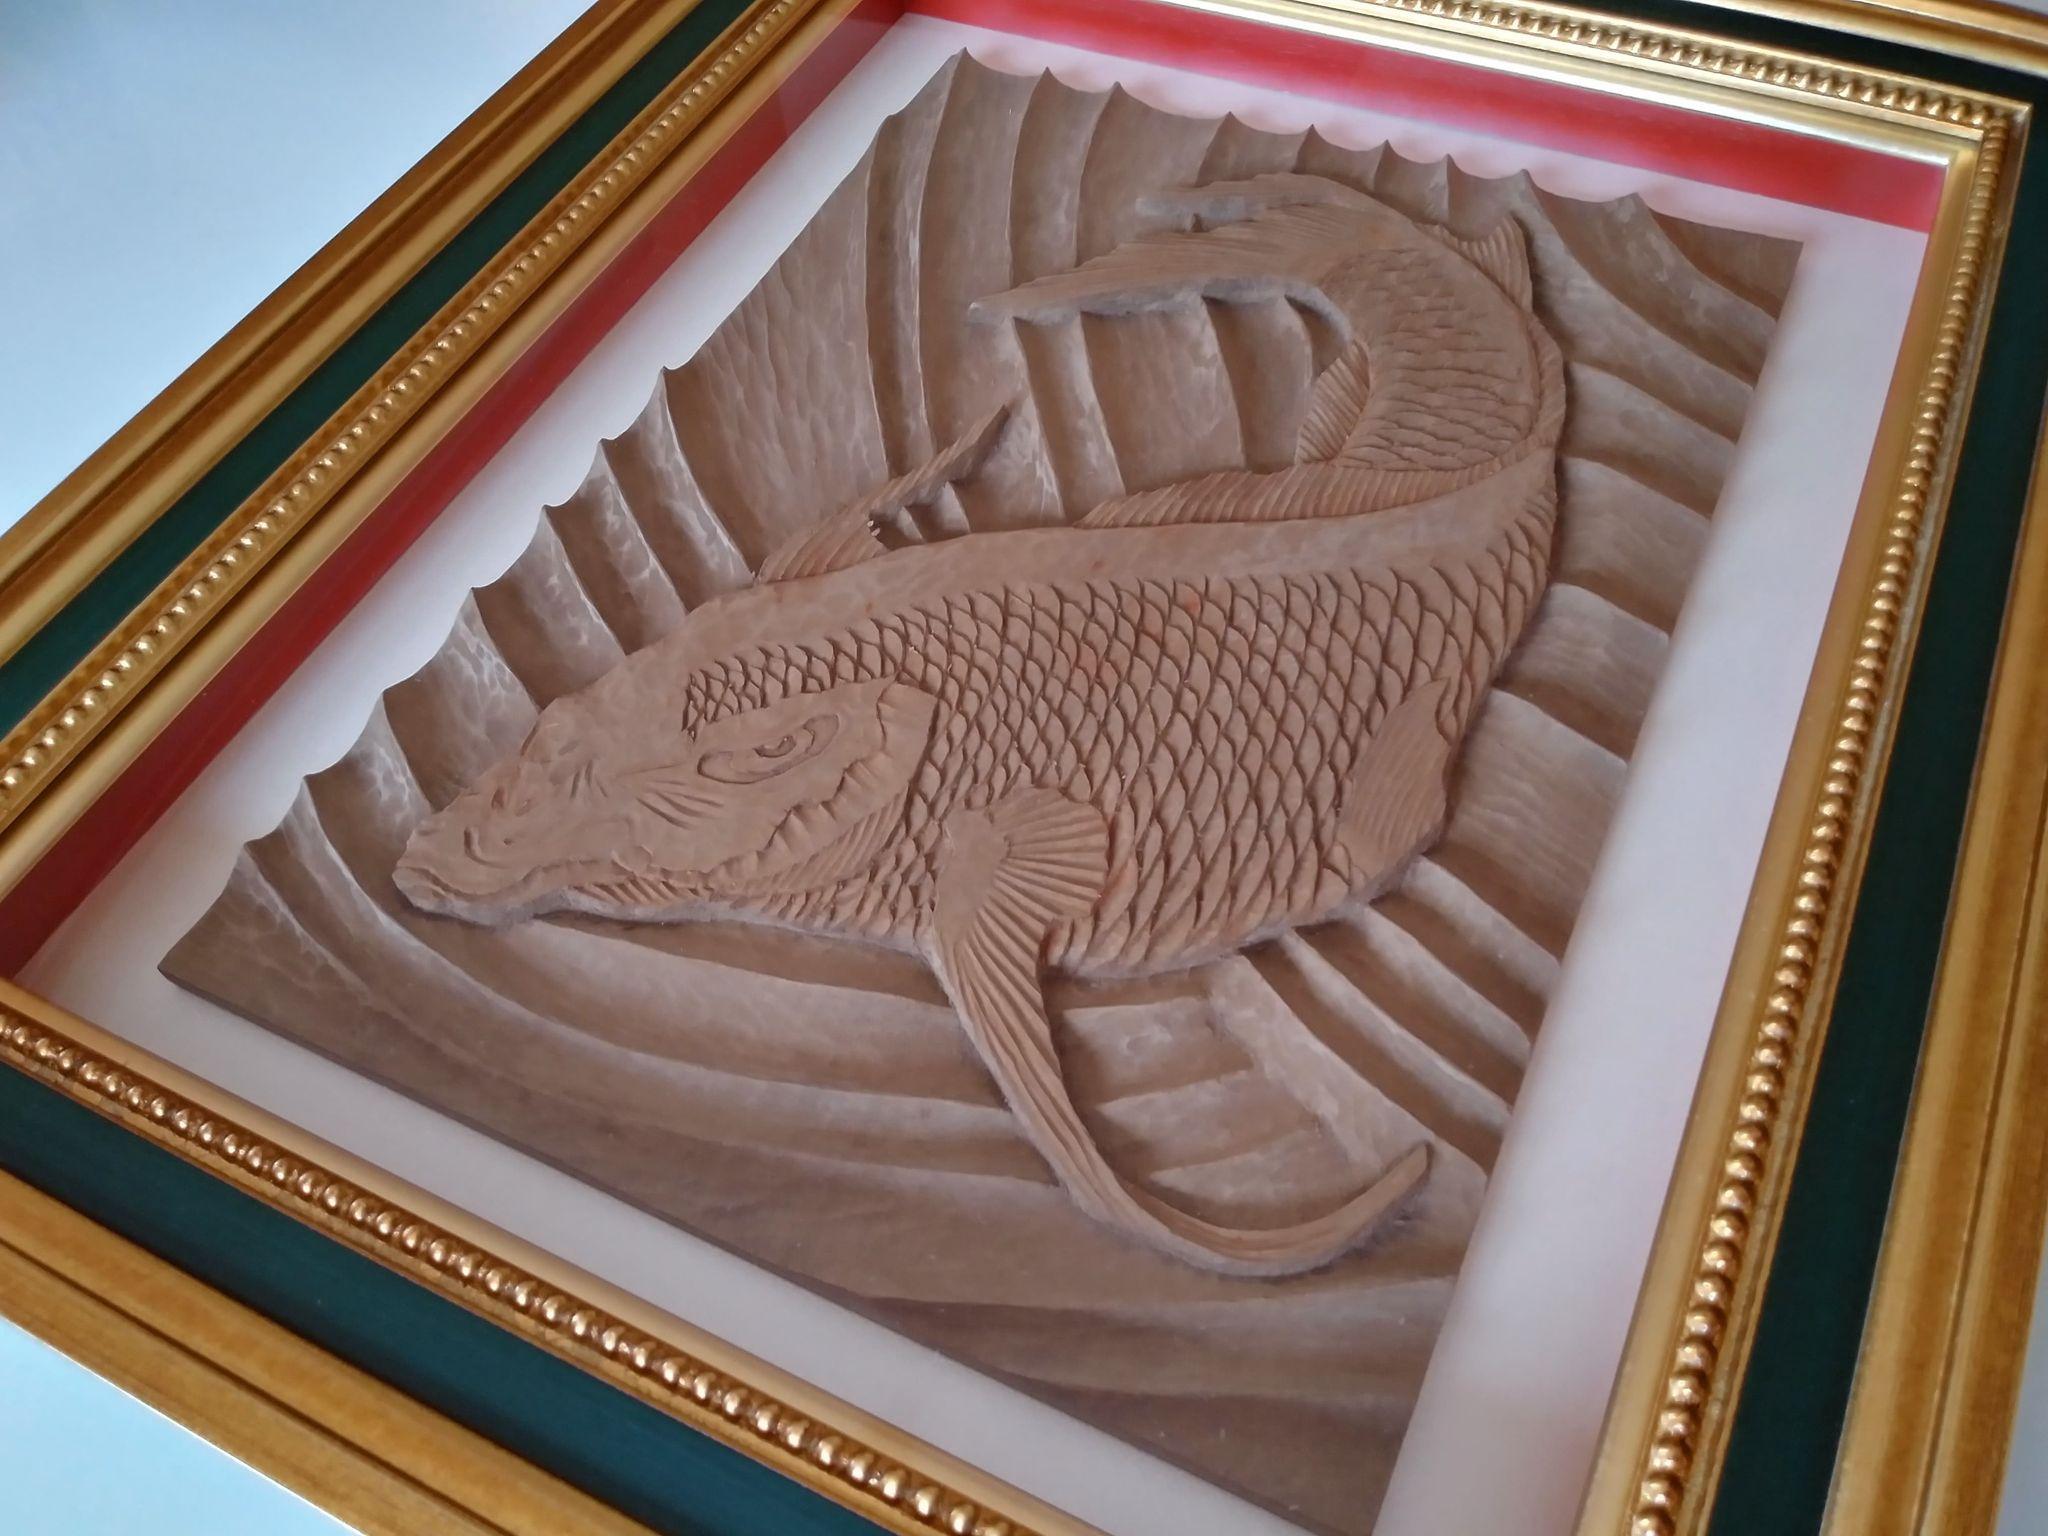 【制作実績】木彫作品『鯉から龍』完成7